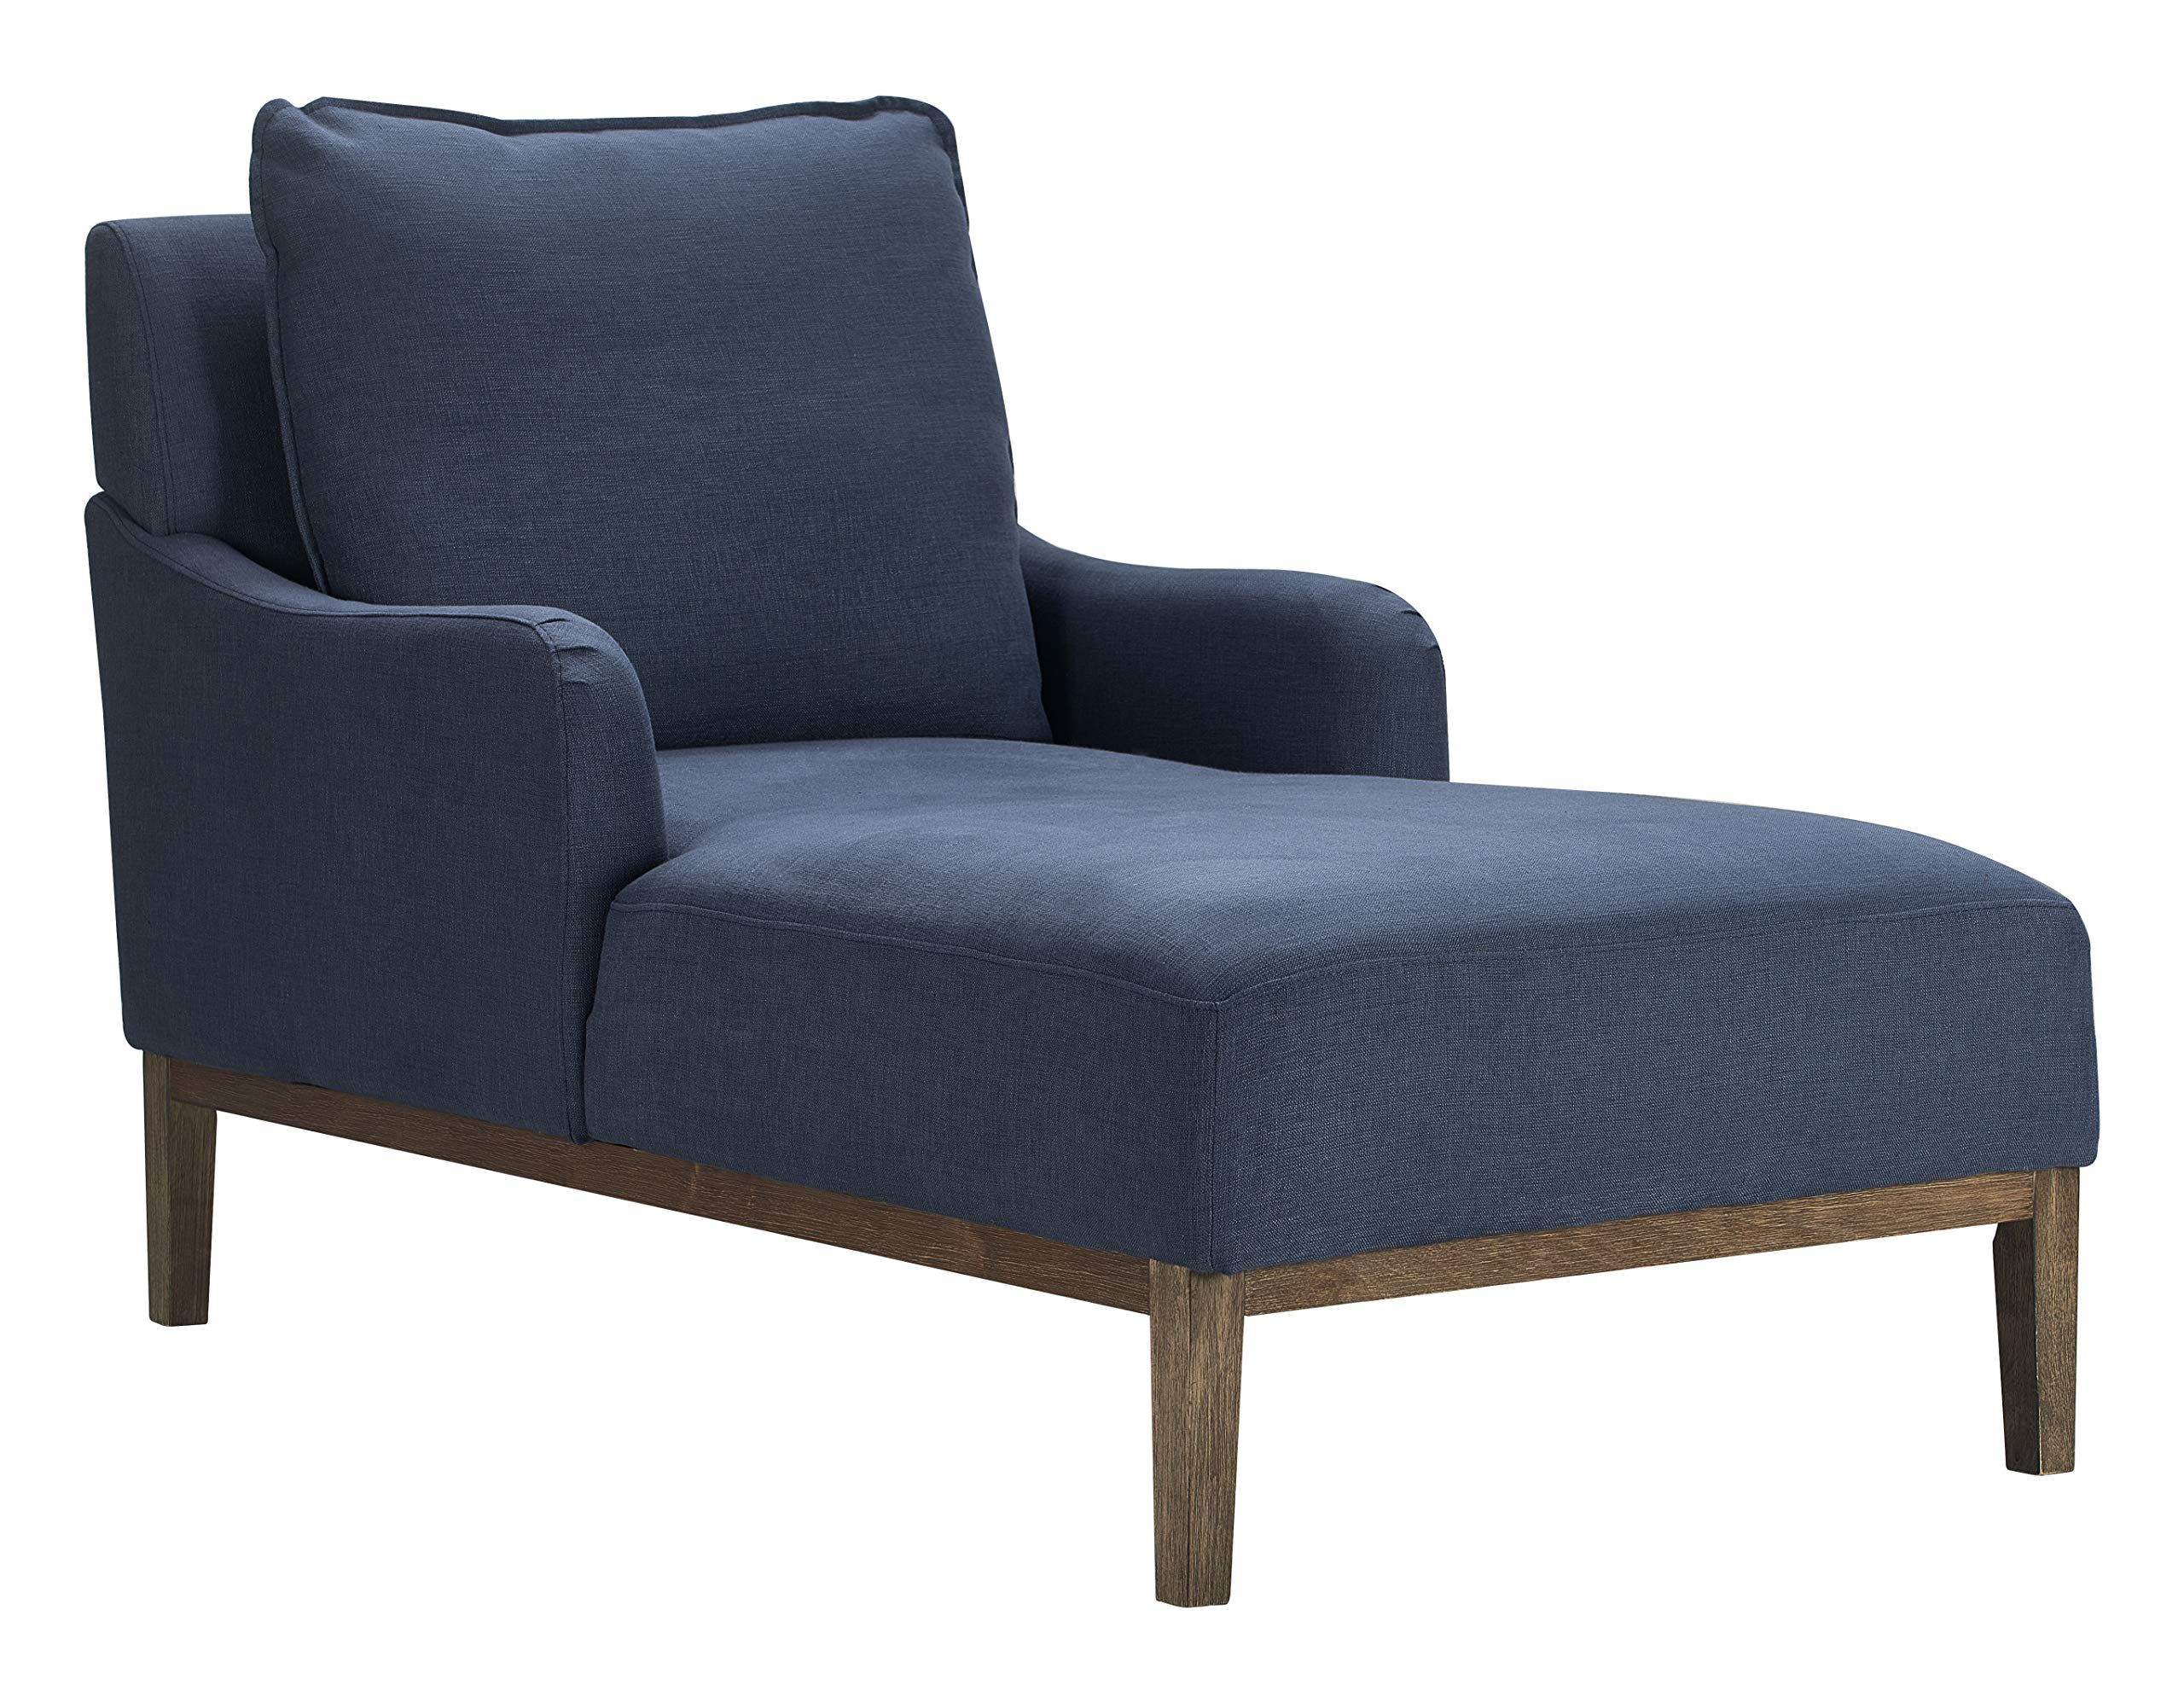 CDM product Finch UPH20062C Elmhurst Chaise Lounge, Blue big image